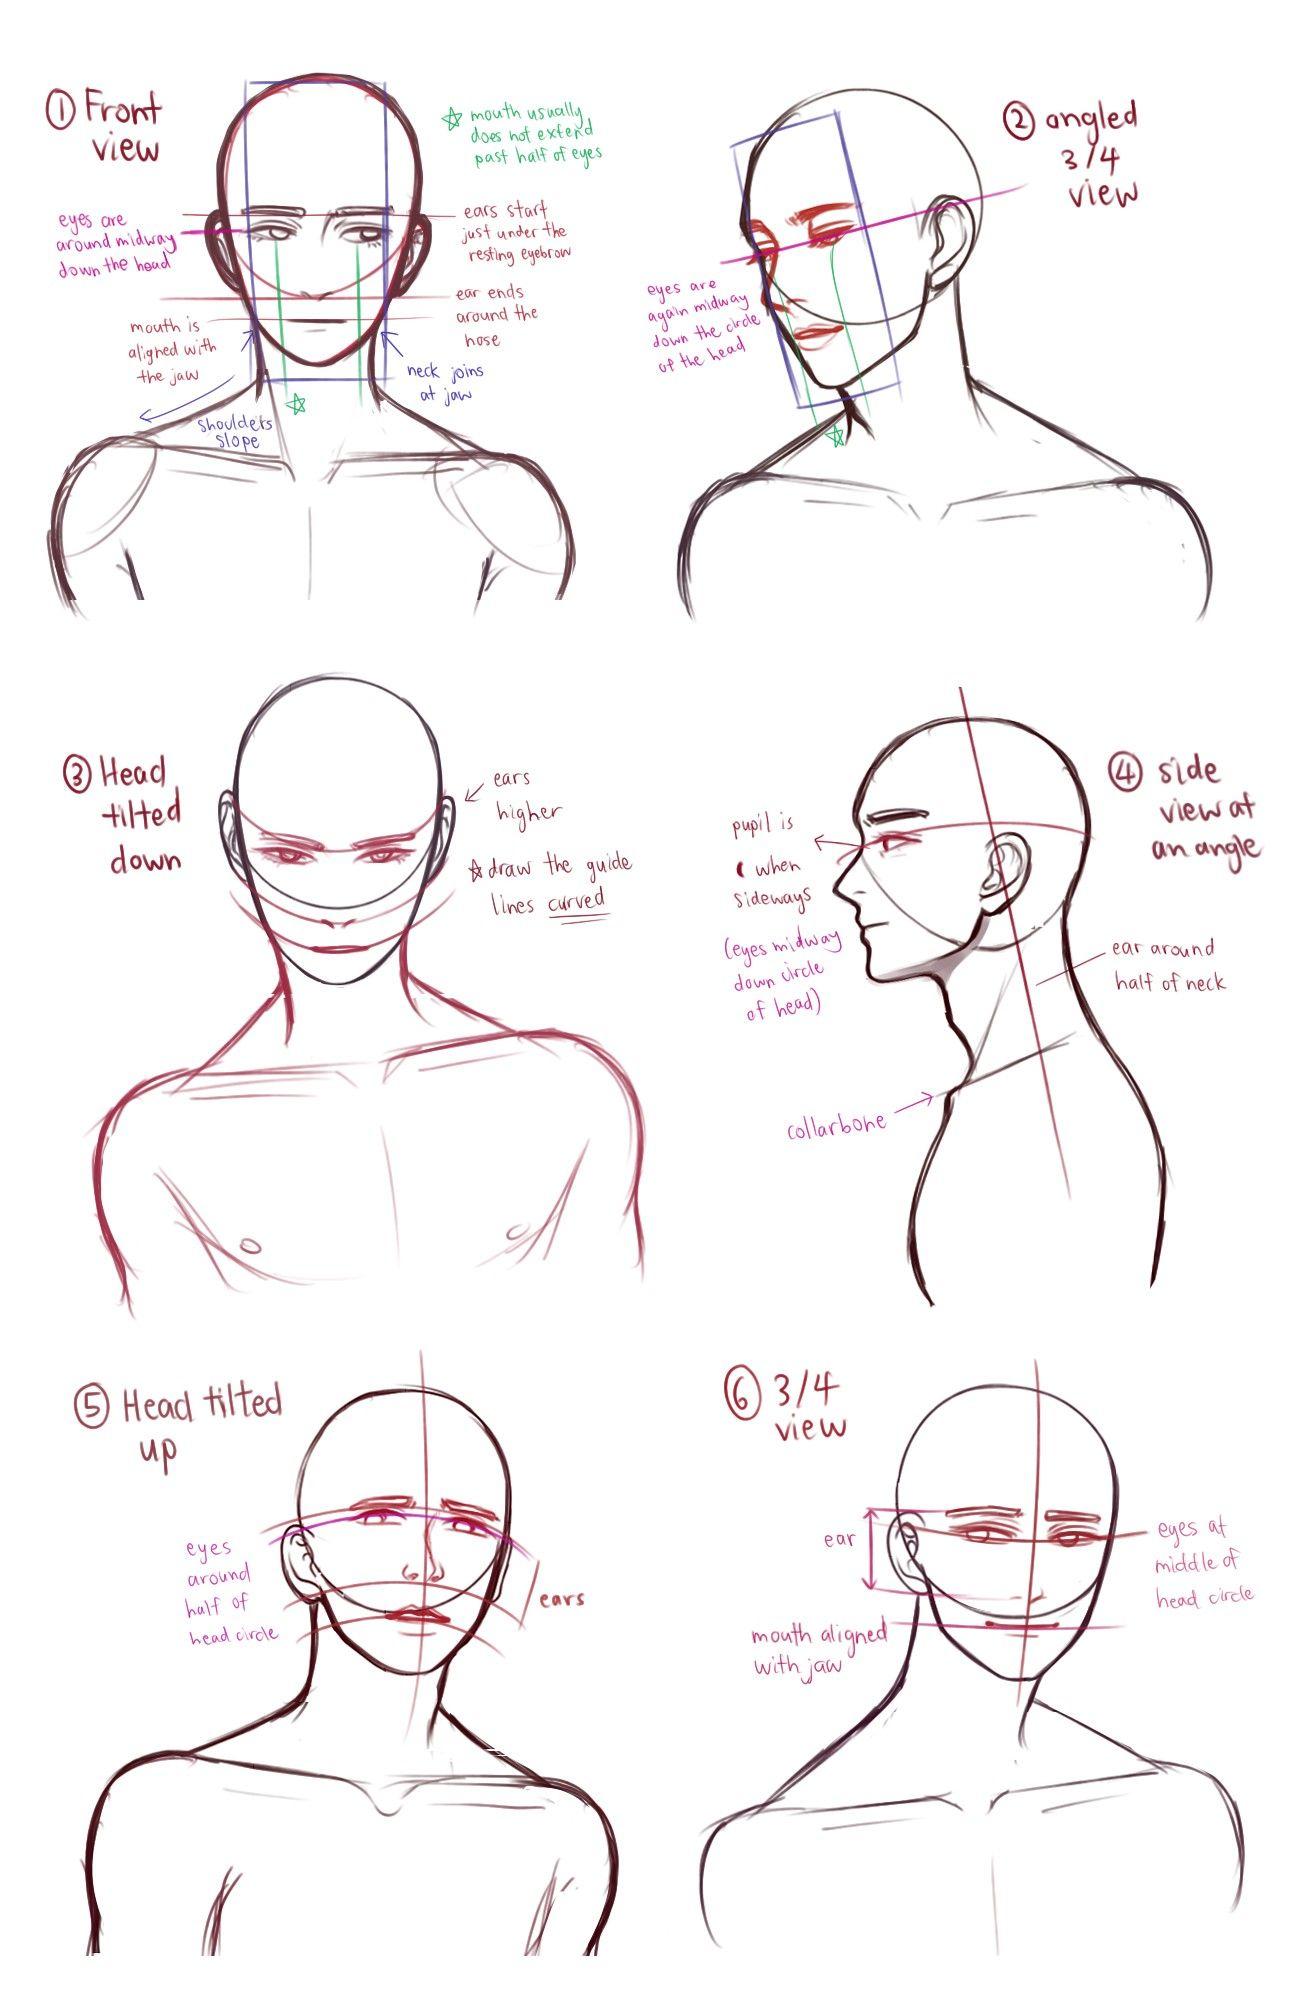 Pin de Max Bala en Anatomia | Pinterest | Diseño de personajes ...